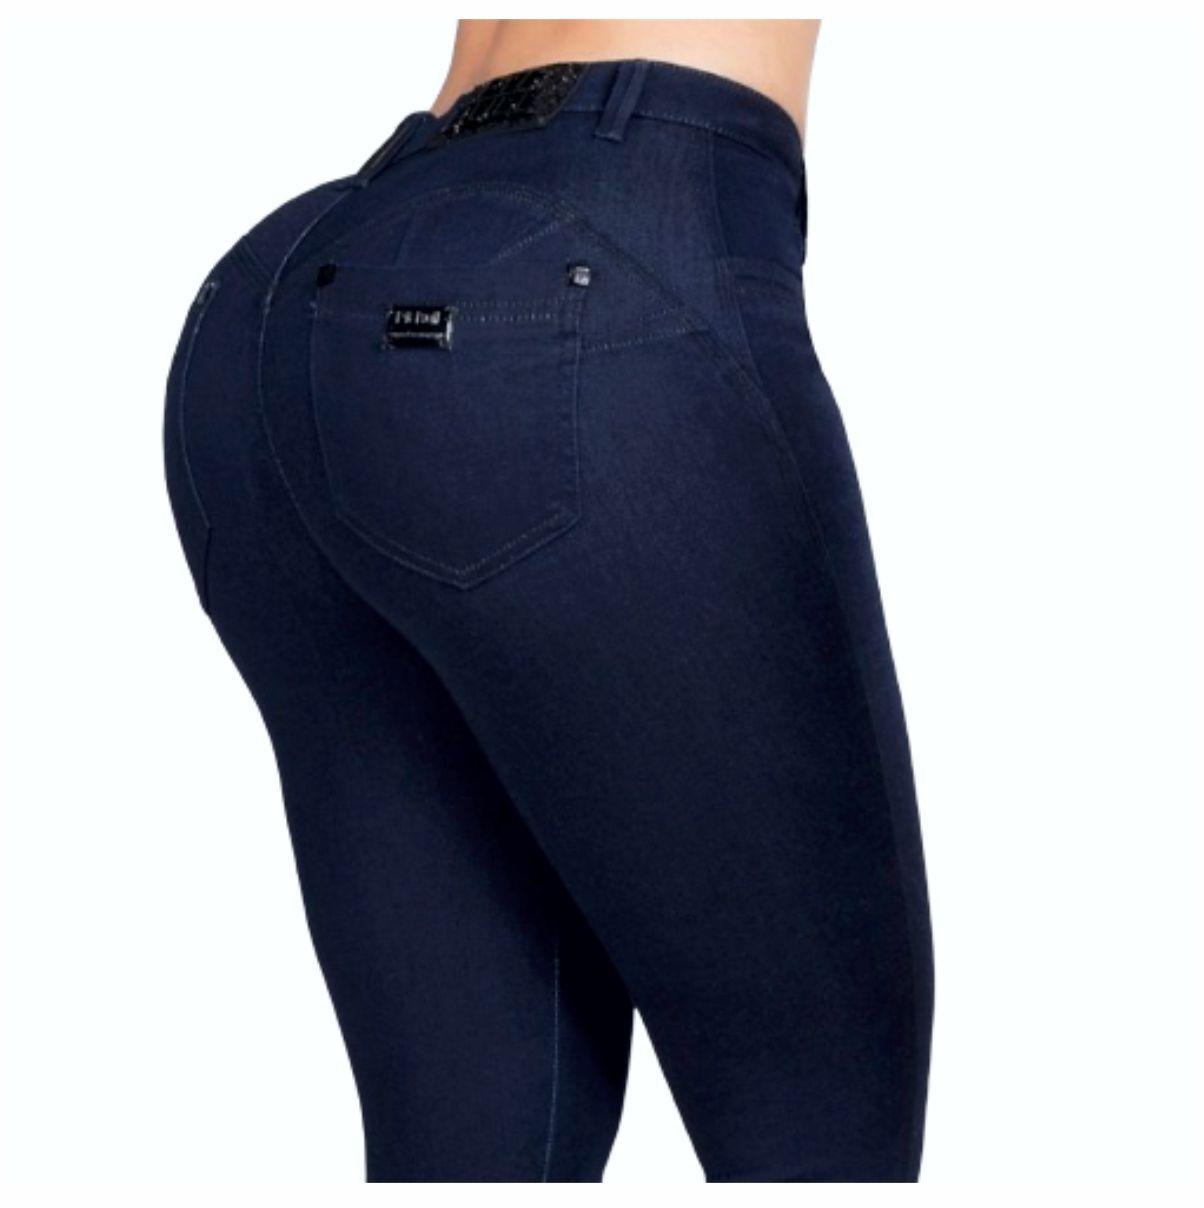 Calça Pit Bull 34152 legging Confort